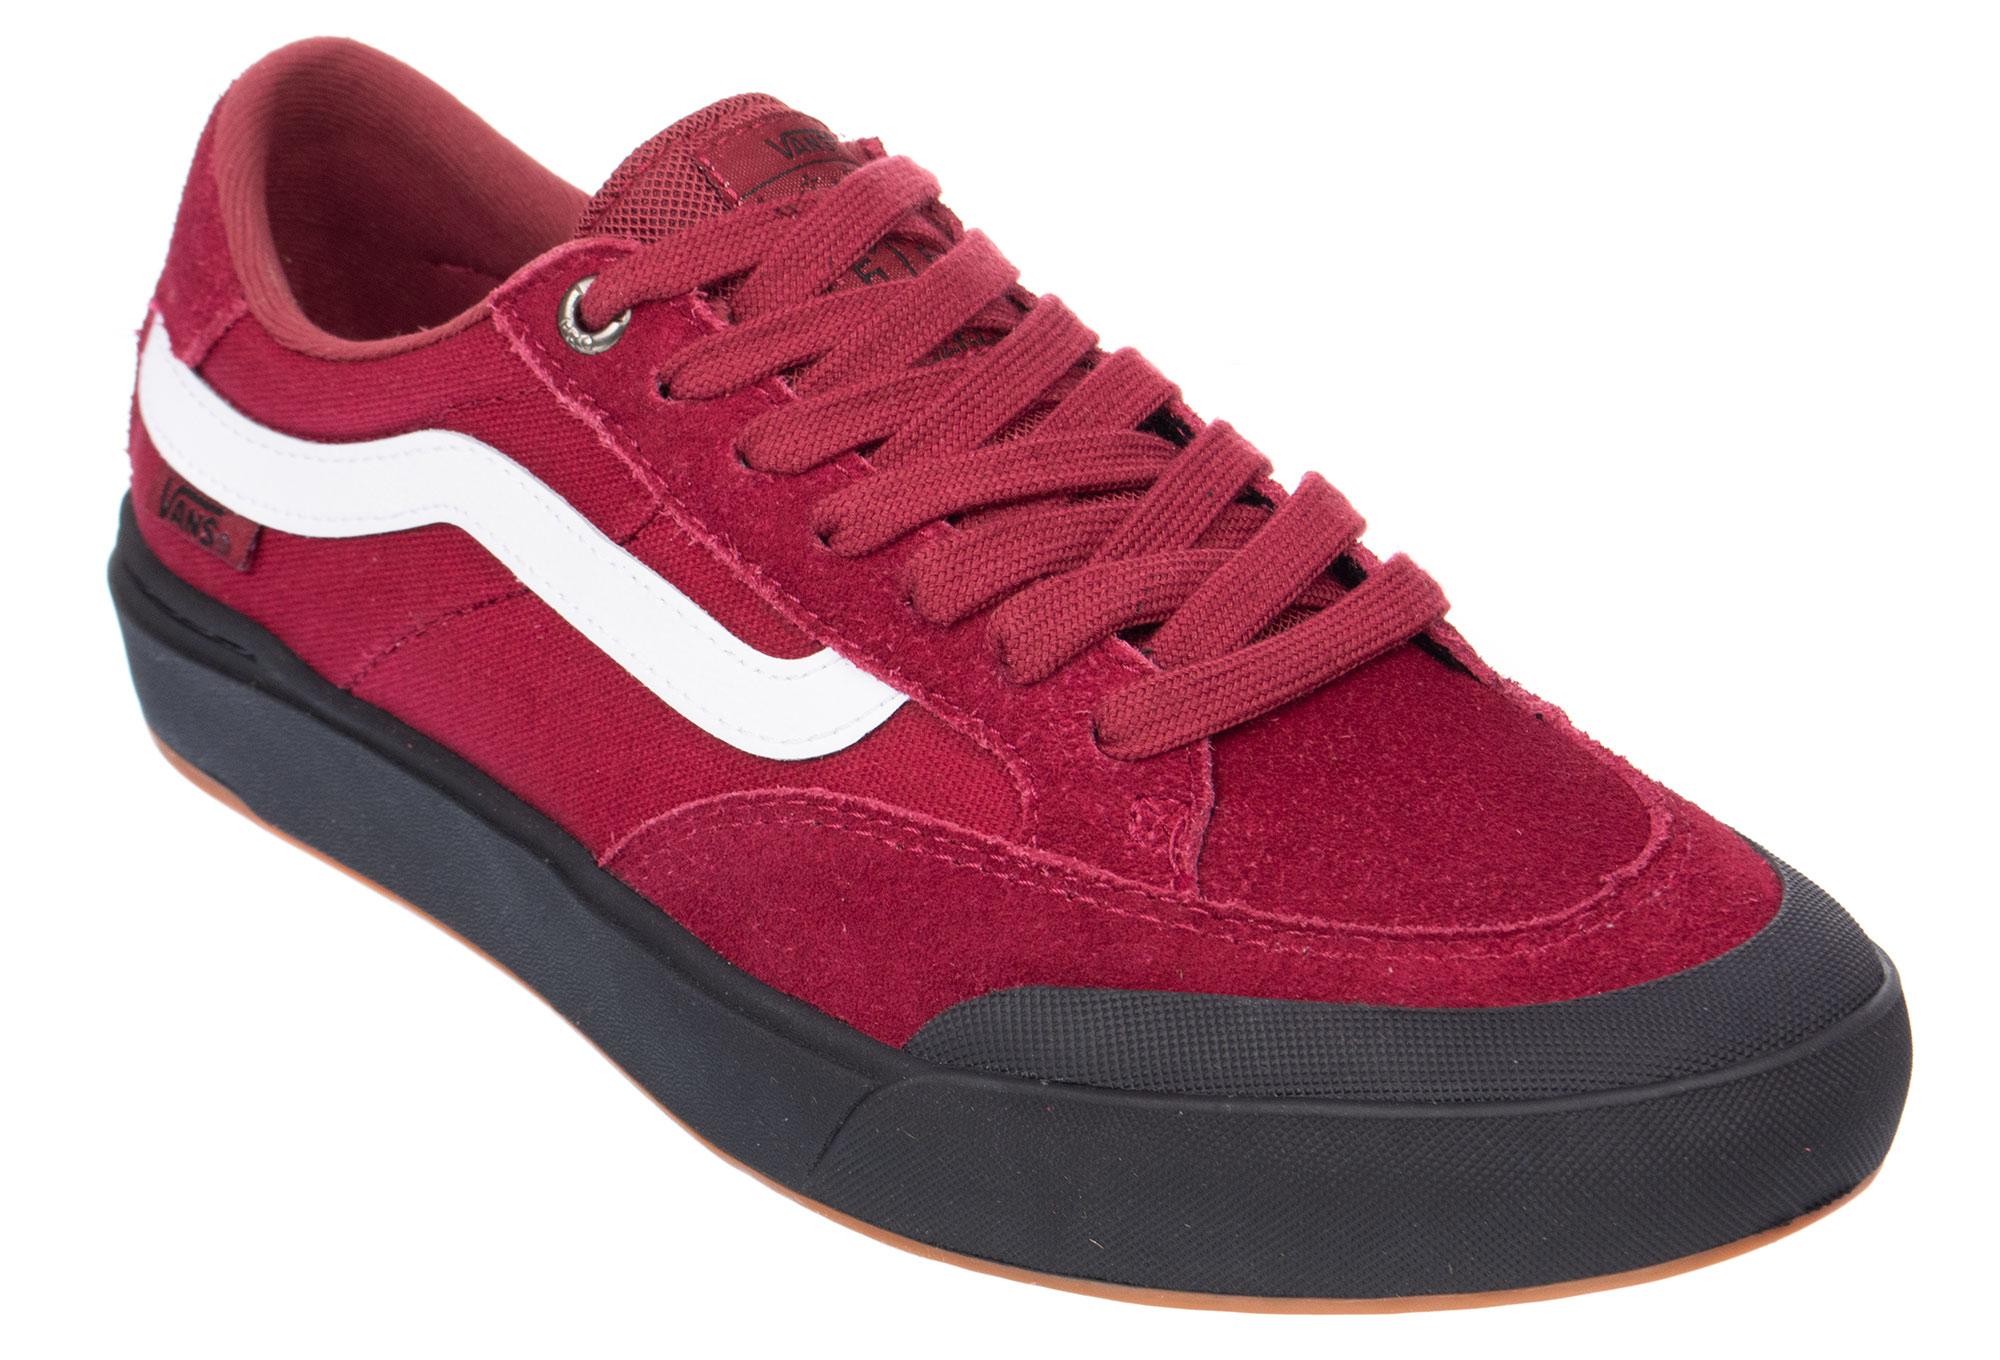 Shoes Pro Berle Rumba Vans Red EH9I2D